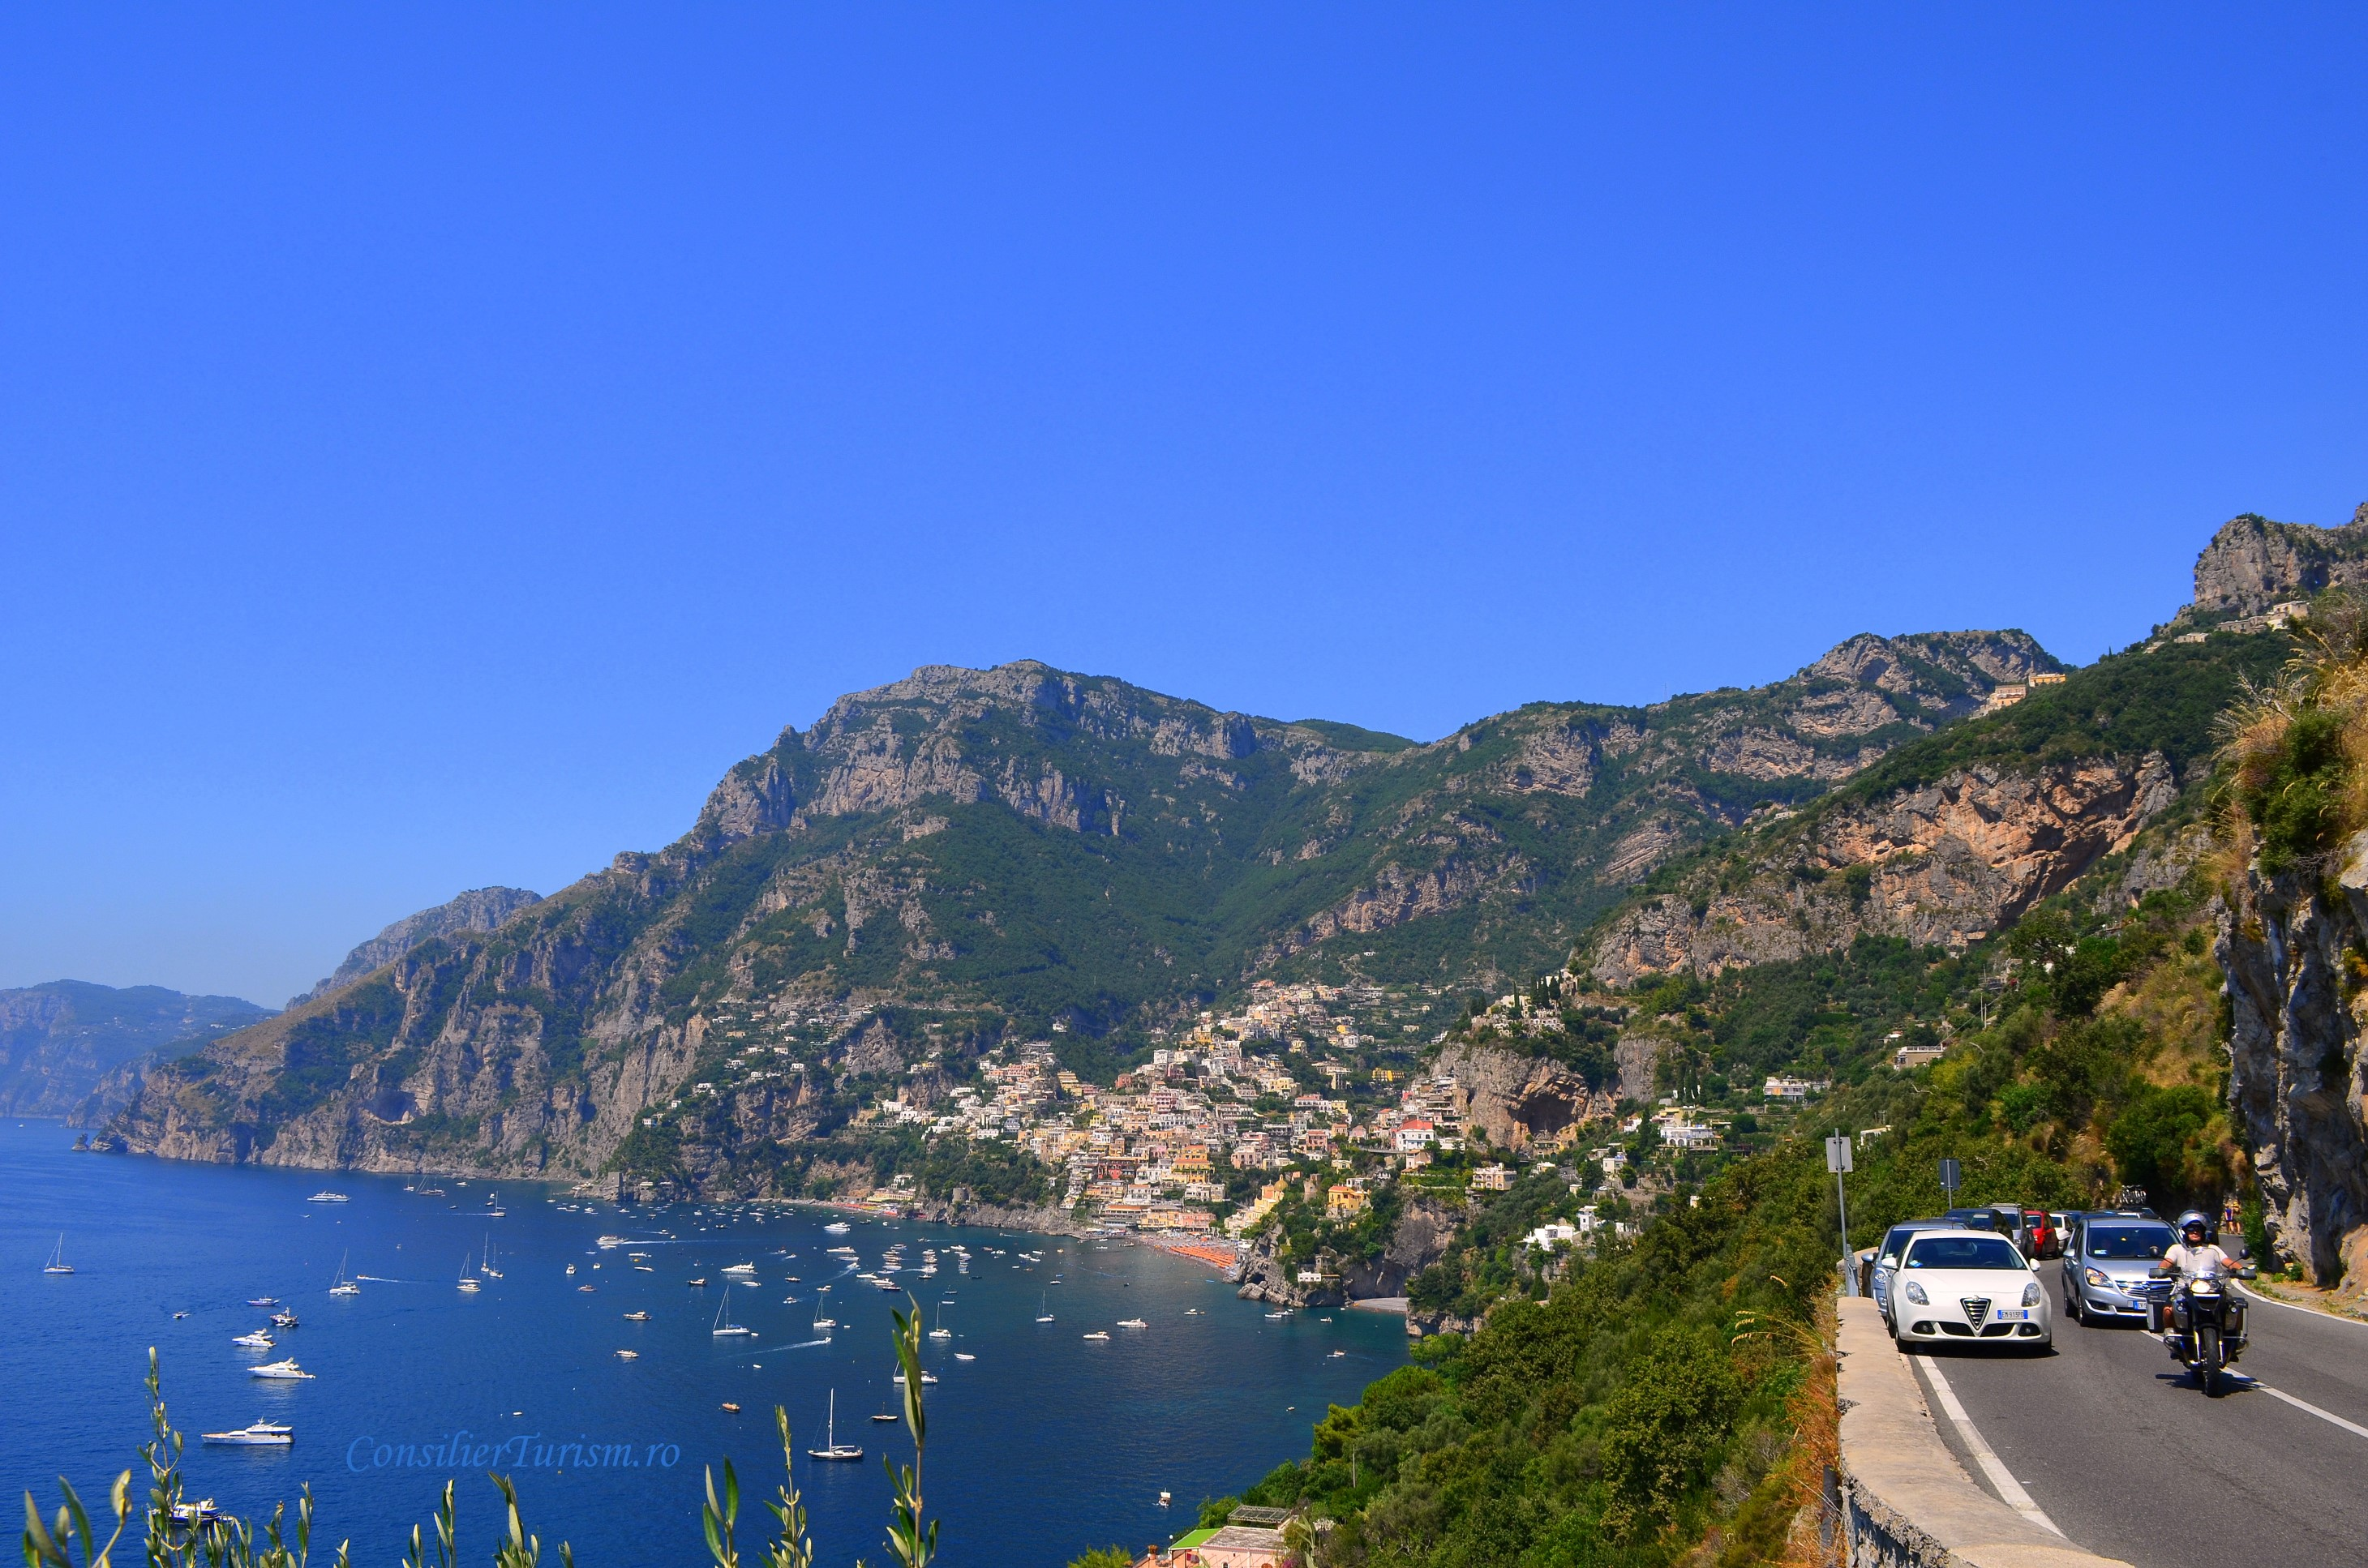 amalfitana ss 163 amalfi coast